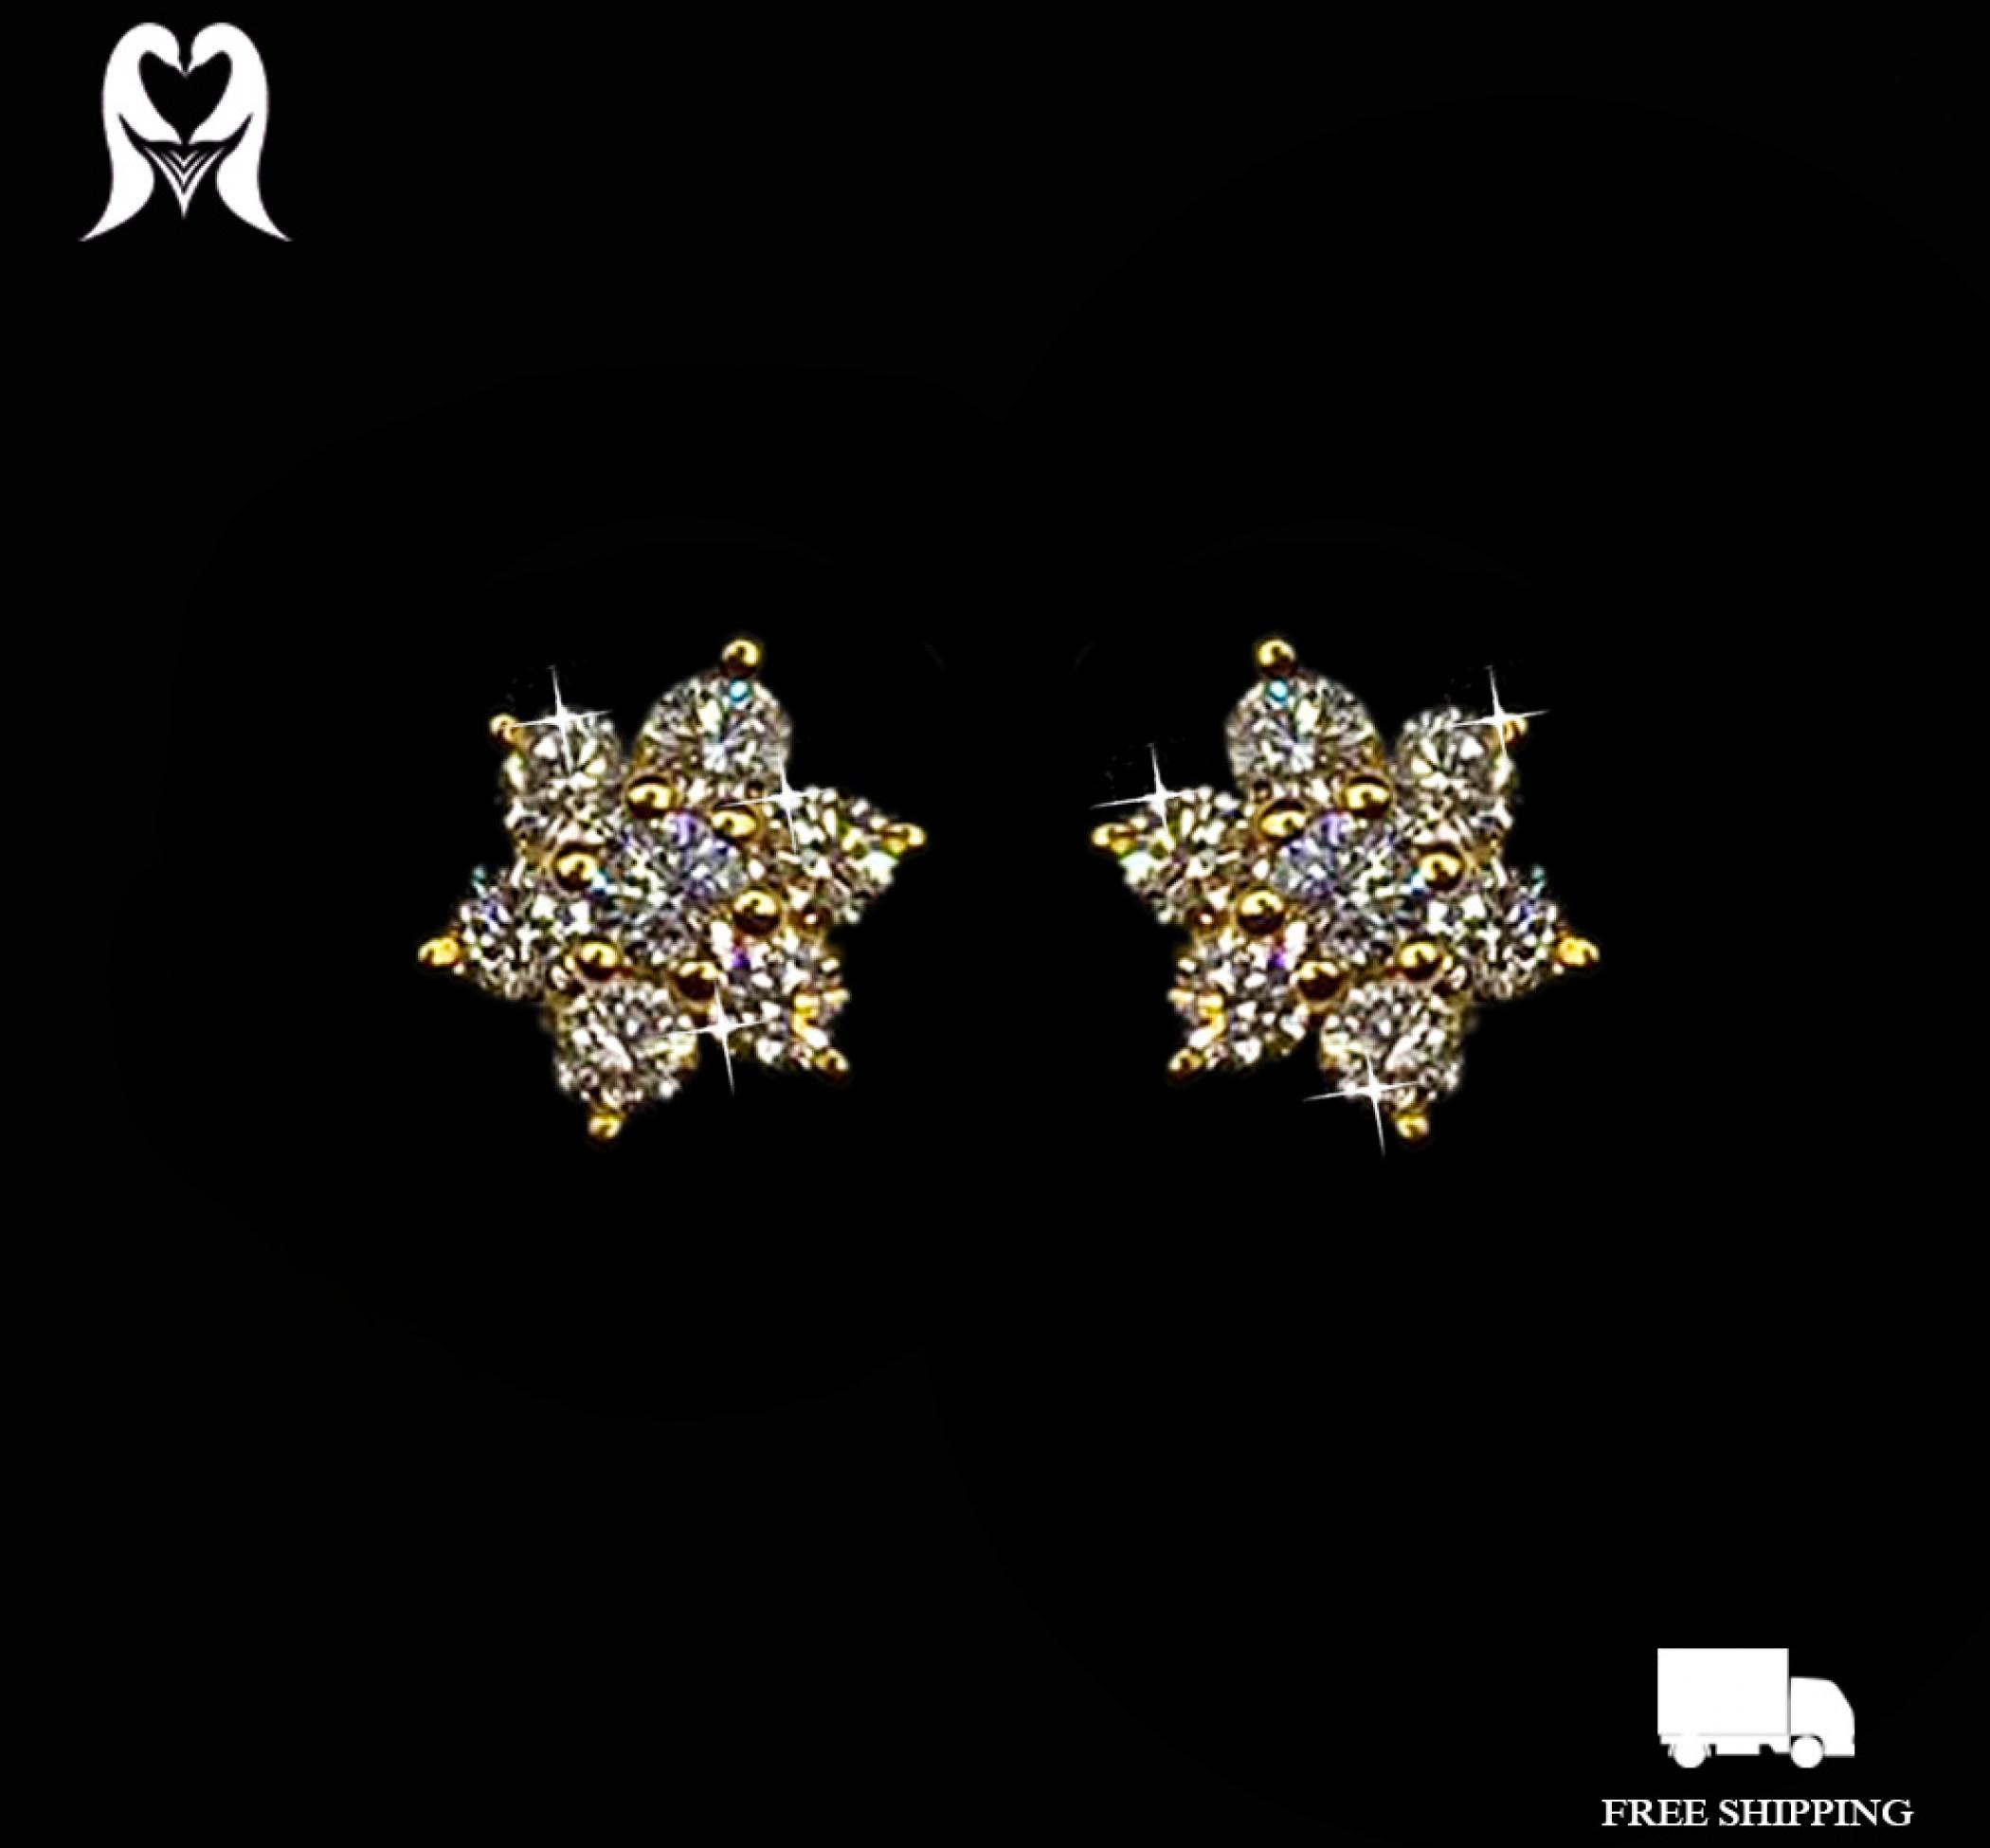 Diamond Earring 22K, 0.42CT 14PCS IGRL-JW000250MY [Wt:1.75 - 2031214]